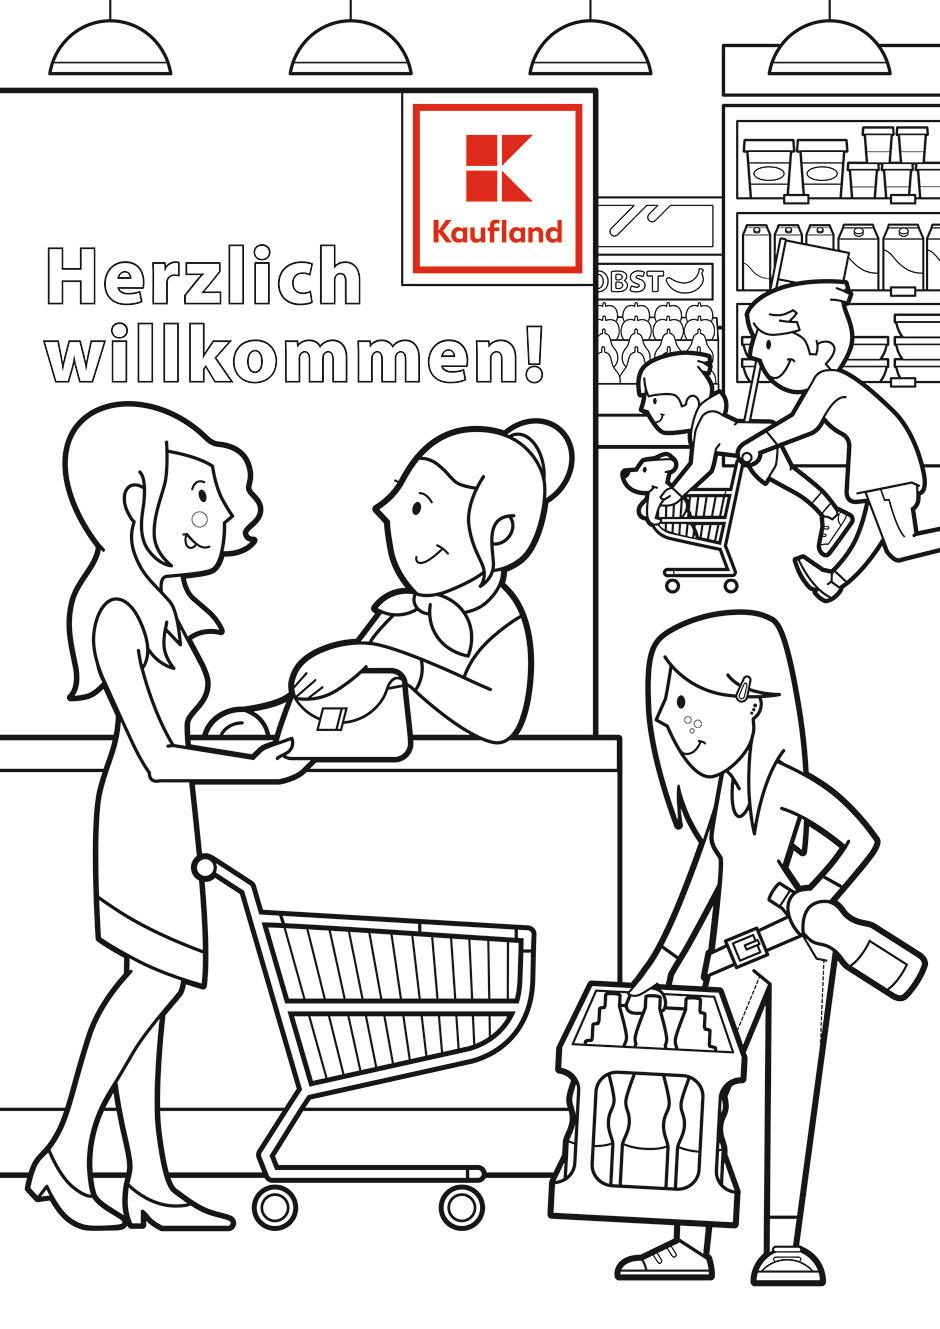 Kaufland_Kinderbuch_Motiv2_3.jpg